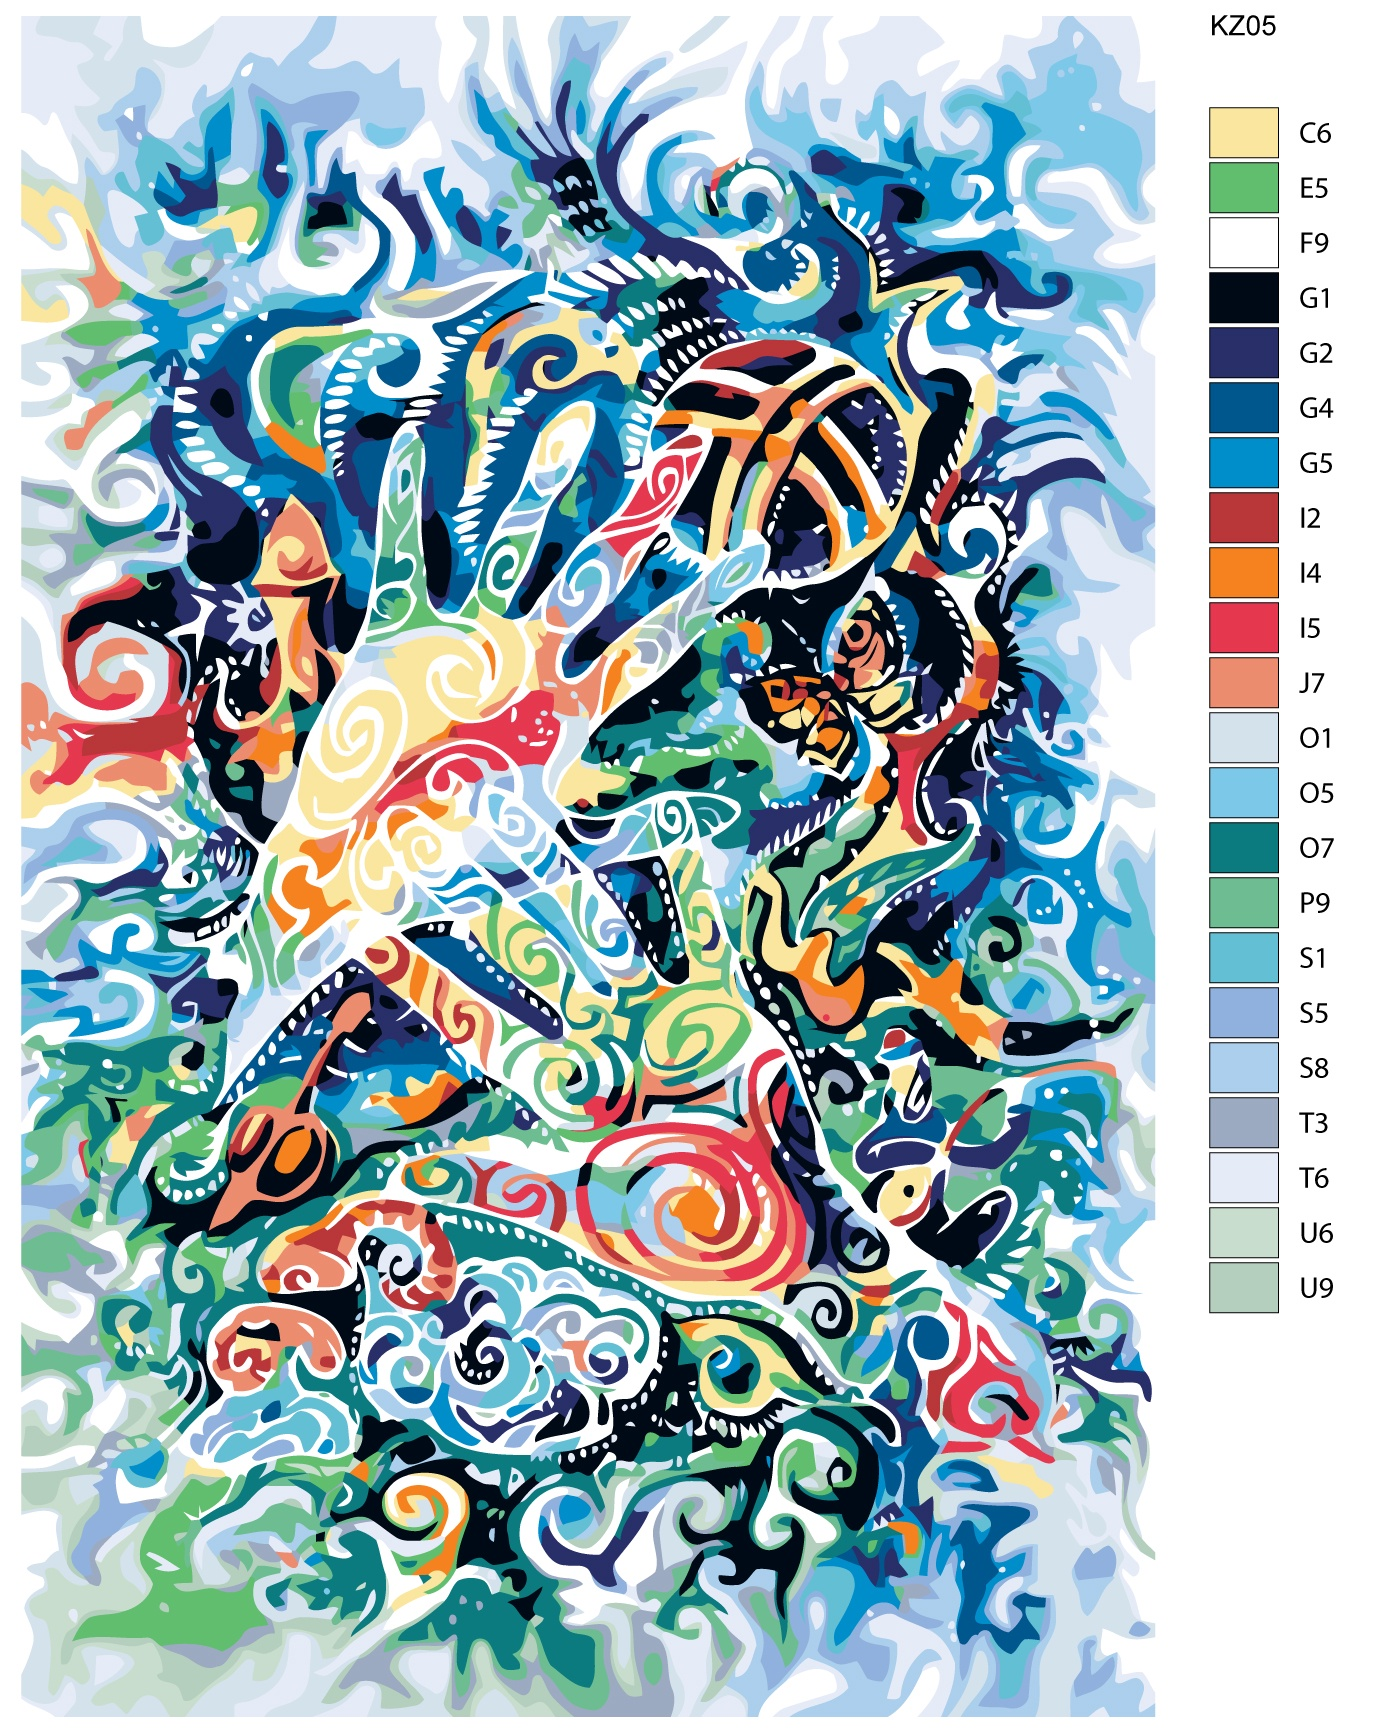 Картина по номерам, 80 x 120 см, KZ05 Живопись по номерам